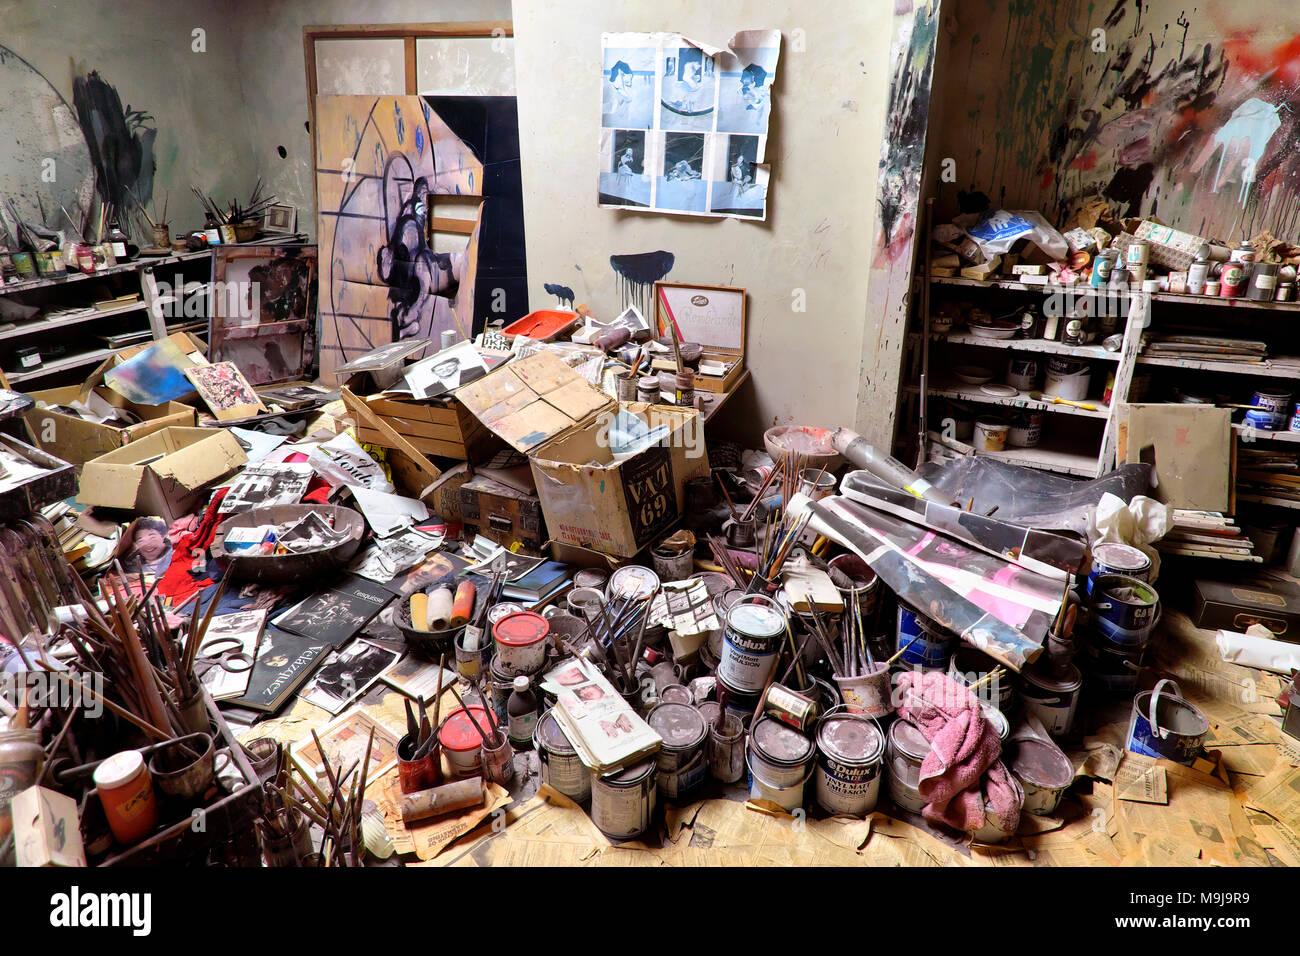 Francis Bacon Studio - reconstructed studio of painter Francis Bacon, Dublin City Gallery The Hugh Lane, Dublin, IrelandStock Photo